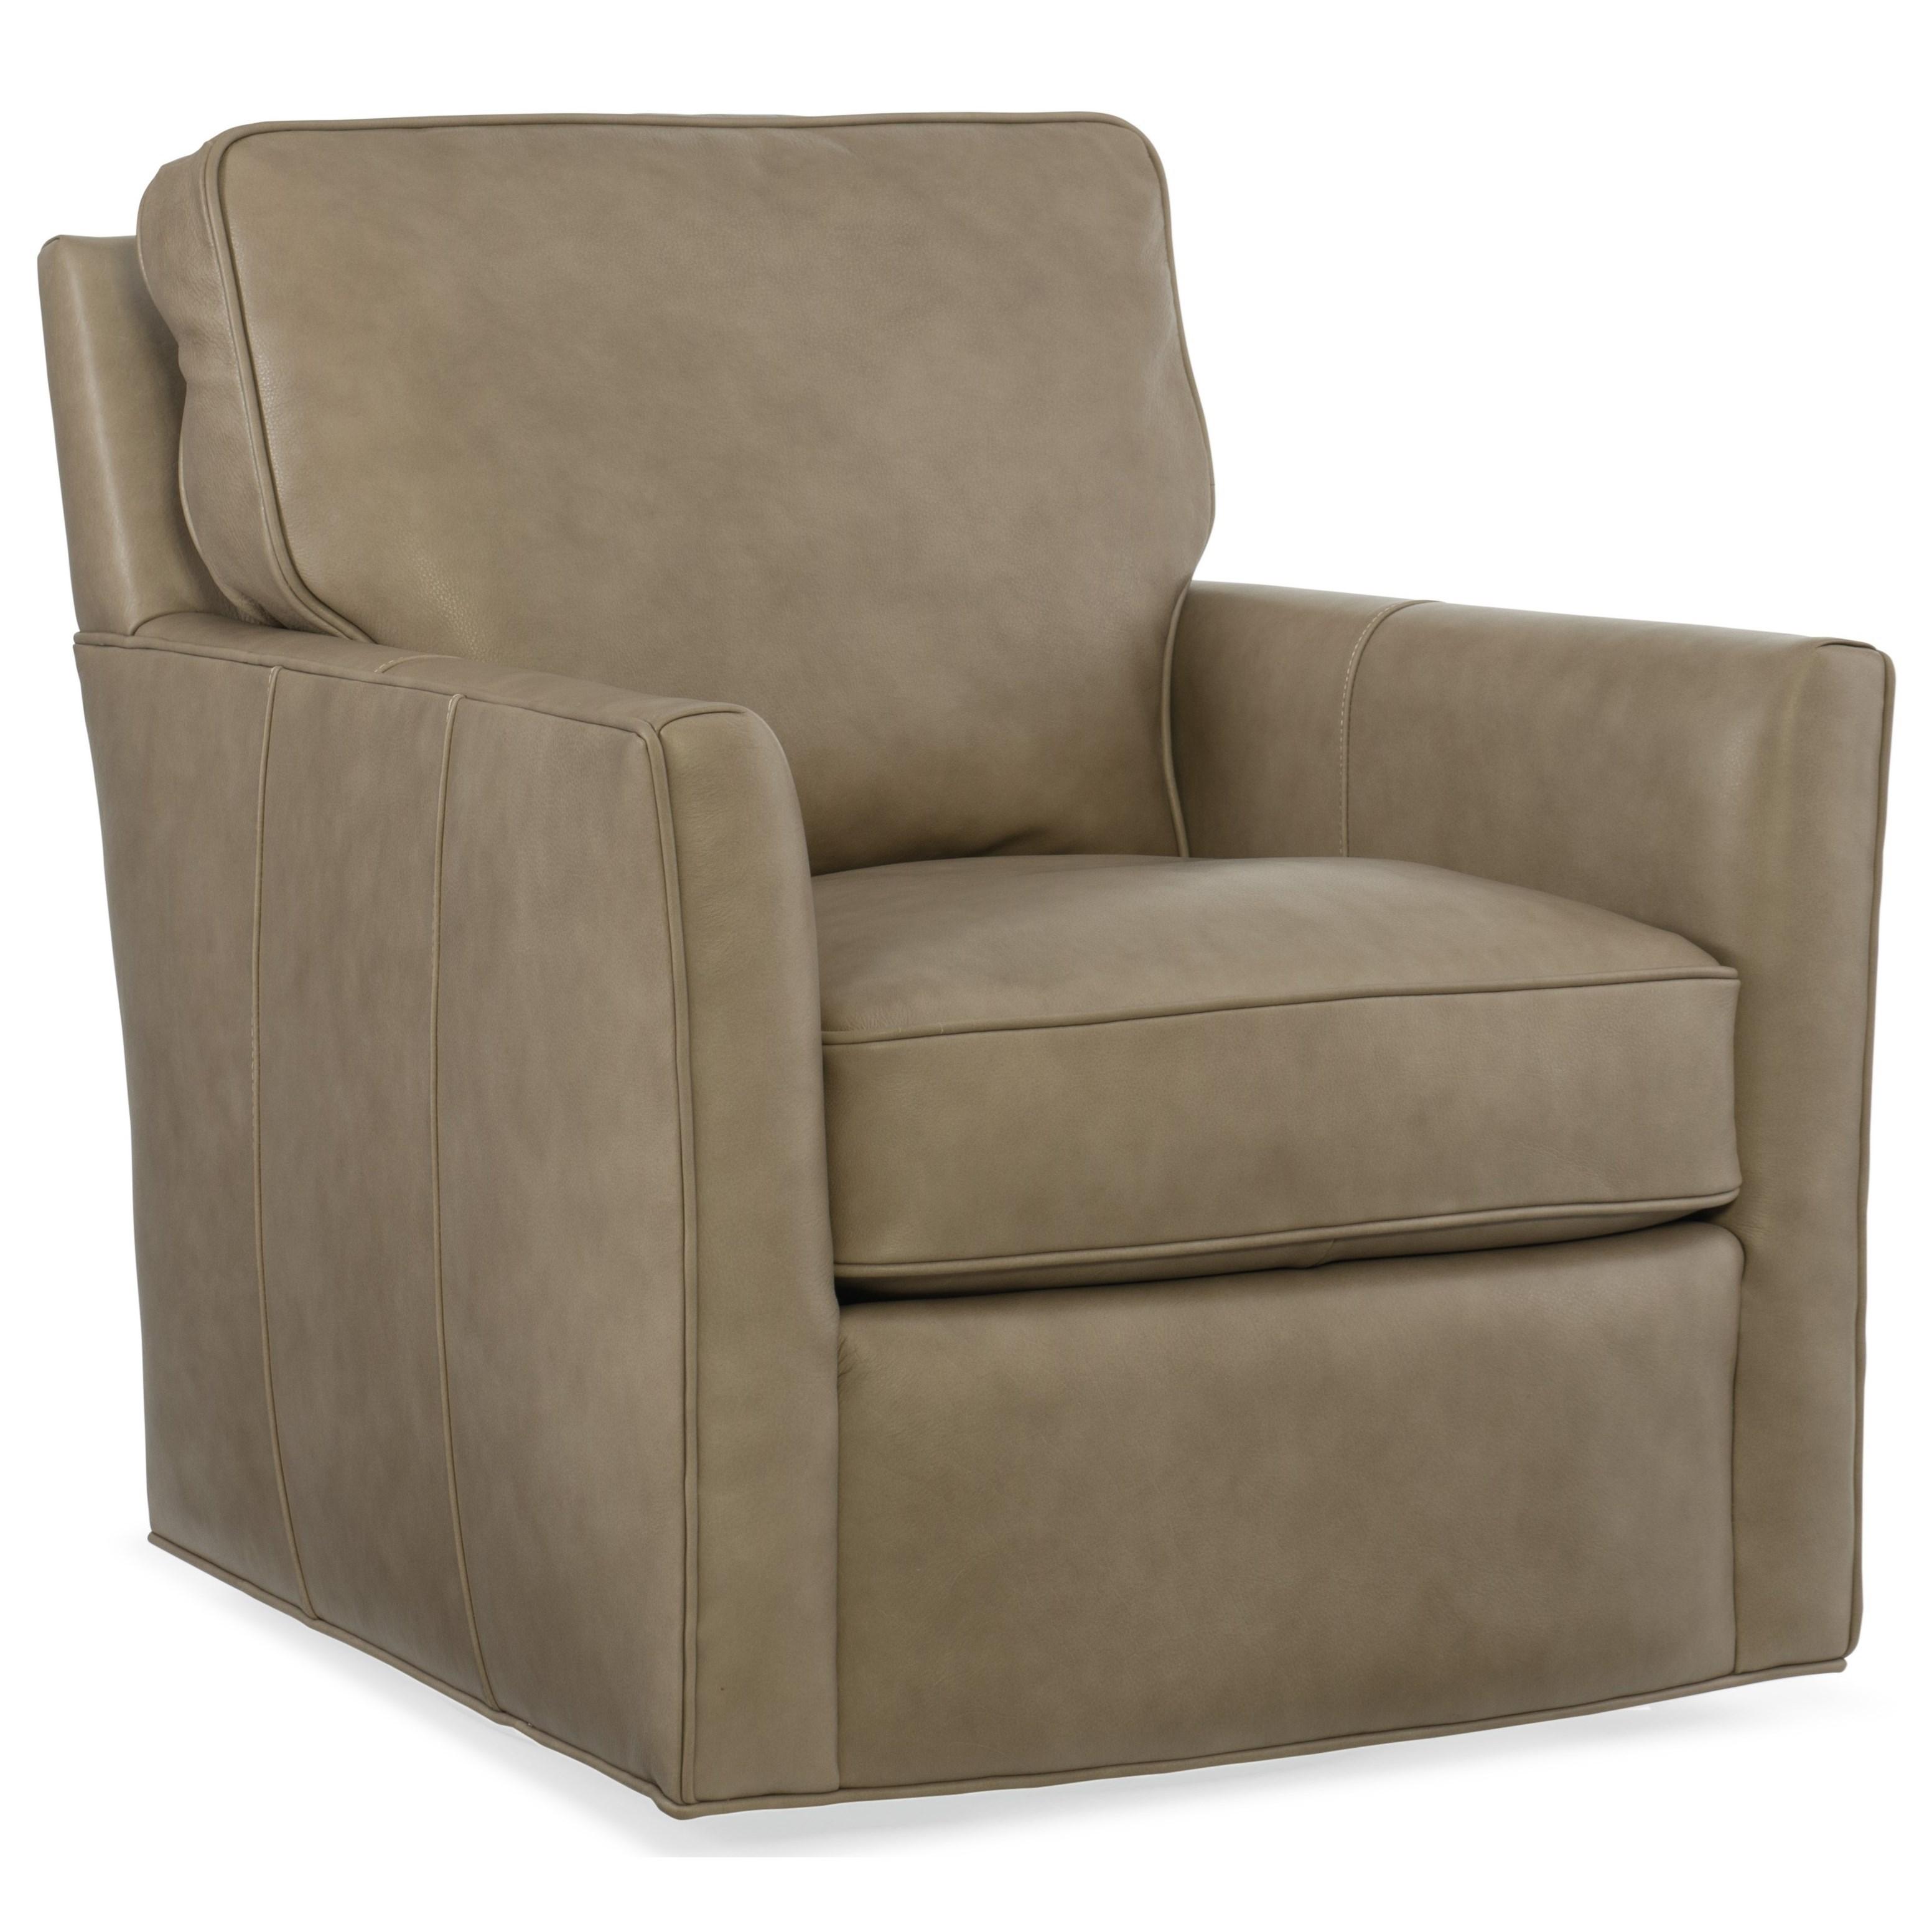 Hooker Furniture Club Chairs Cc434 Sw 083 Mandy Swivel